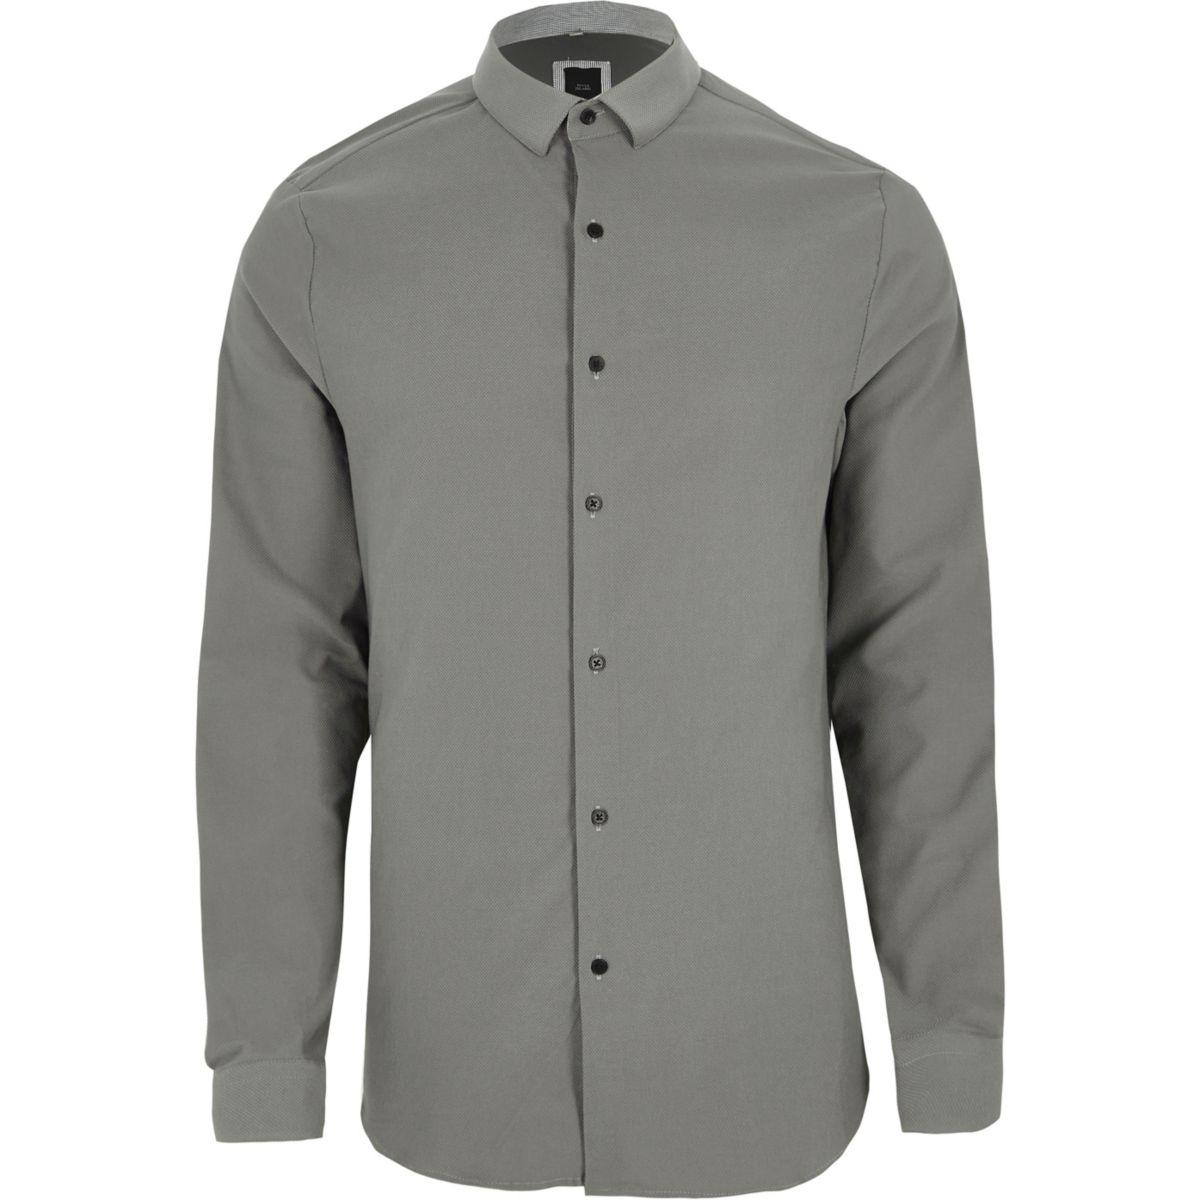 Grey textured long sleeve skinny fit shirt